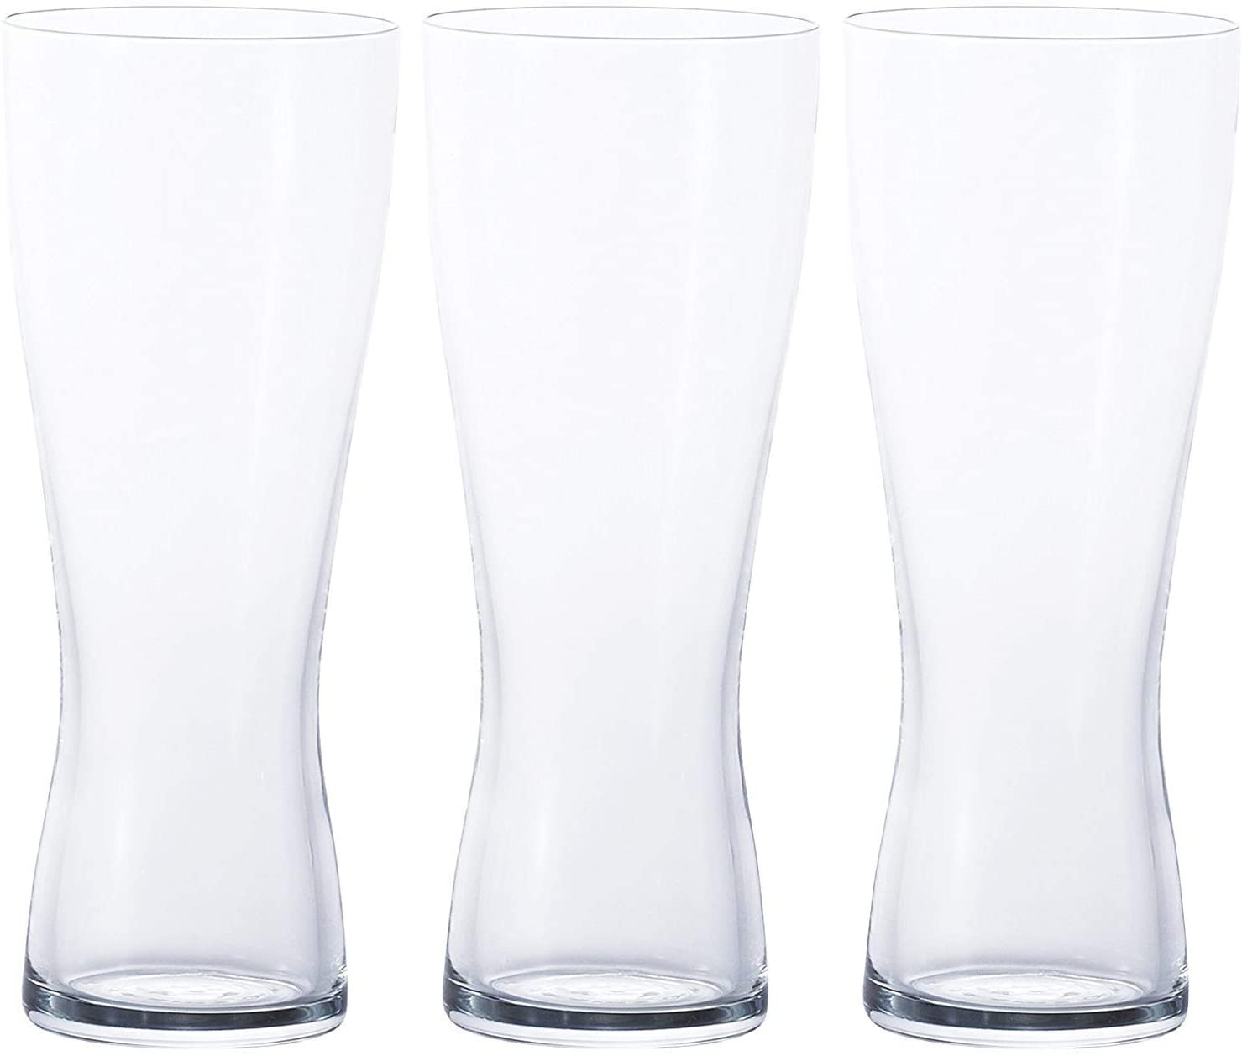 ADERIA(アデリア) 薄吹き ビアグラス Lの商品画像7